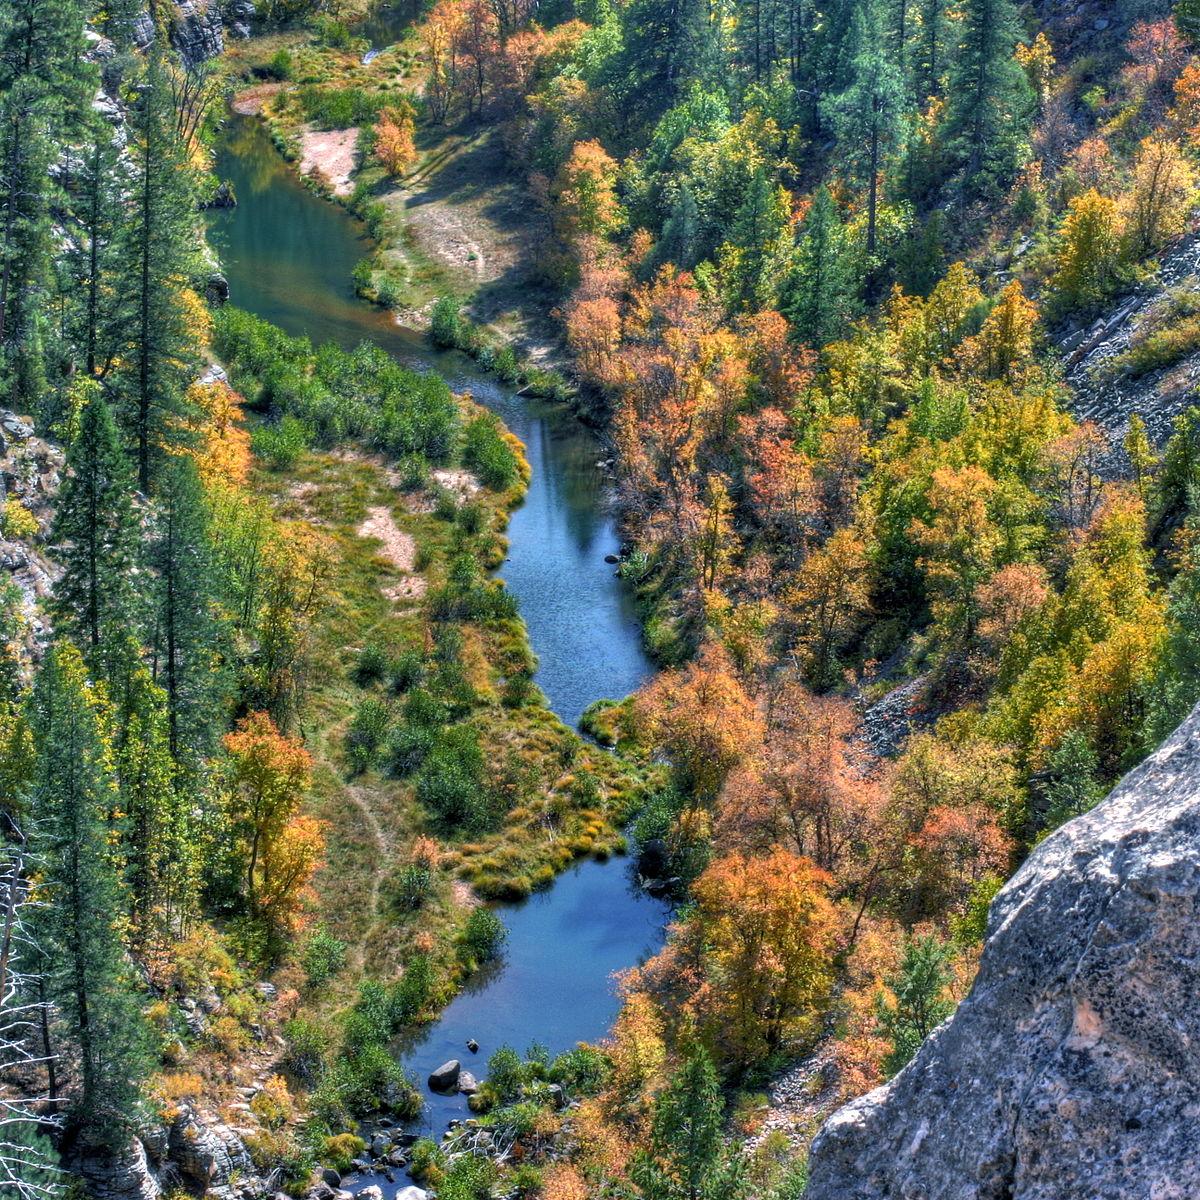 Blue ridge reservoir wikipedia for Camping and fishing in arizona